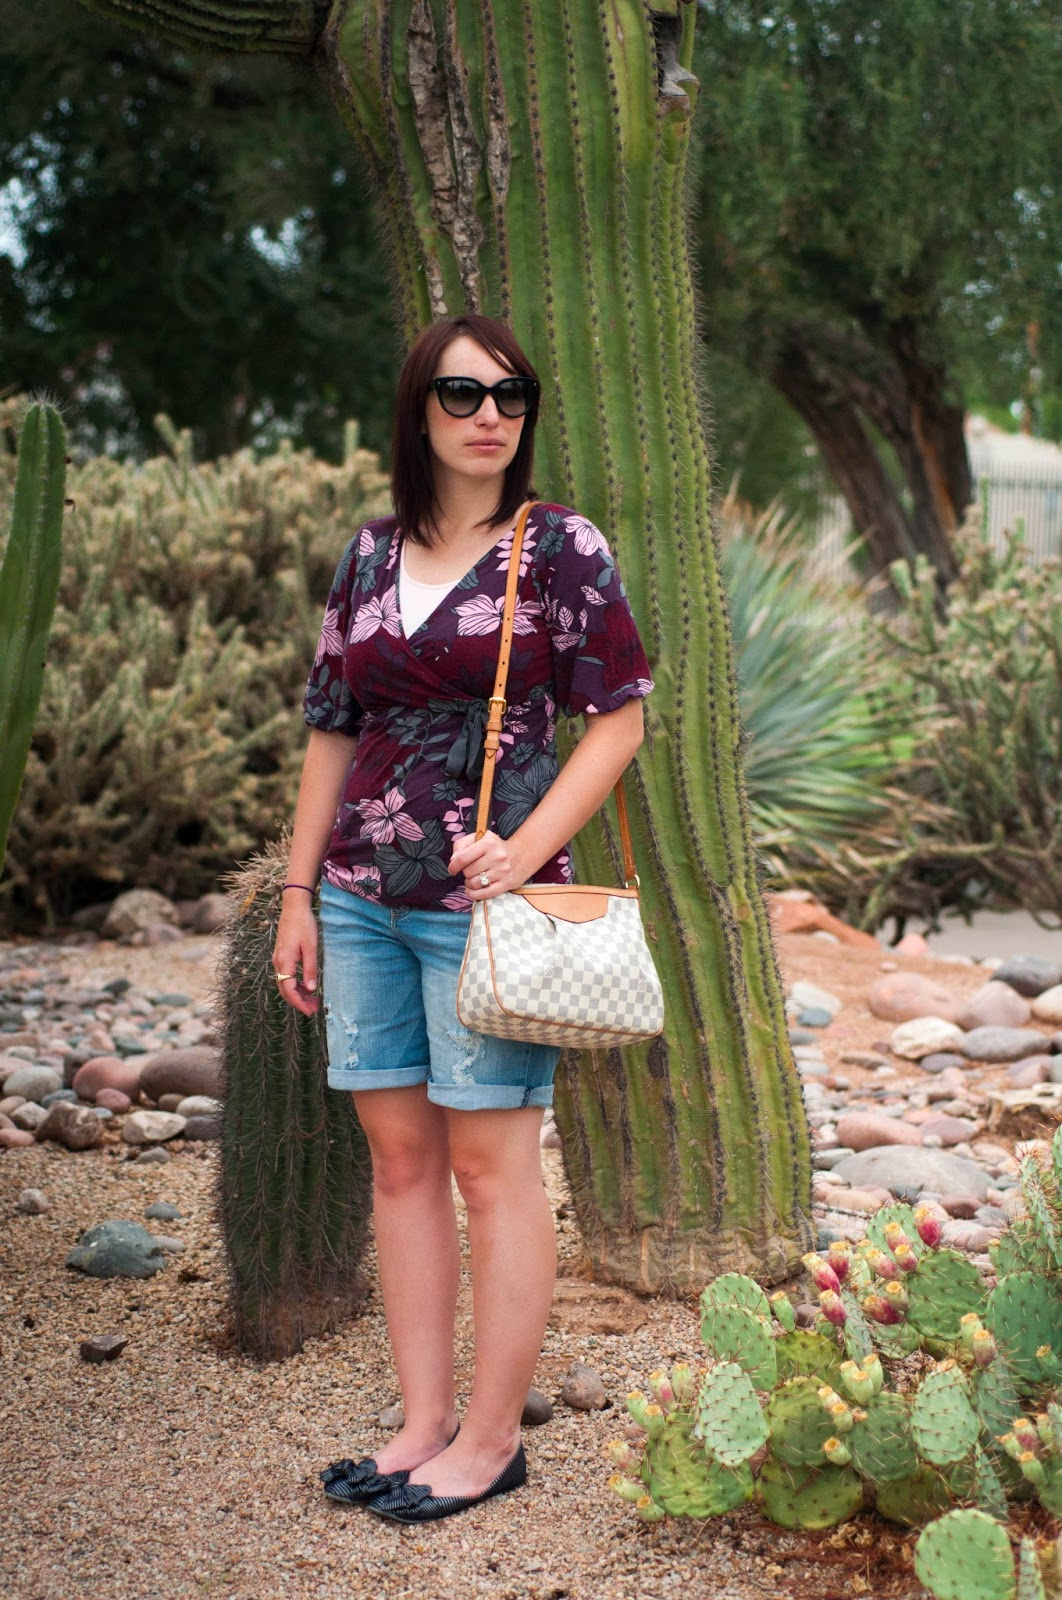 style blog, fashion blog, ootd, louis vuitton white purse, rocket dog bow shoes, karen kane floral shirt, floral shirt, prada cats eye sunglasses